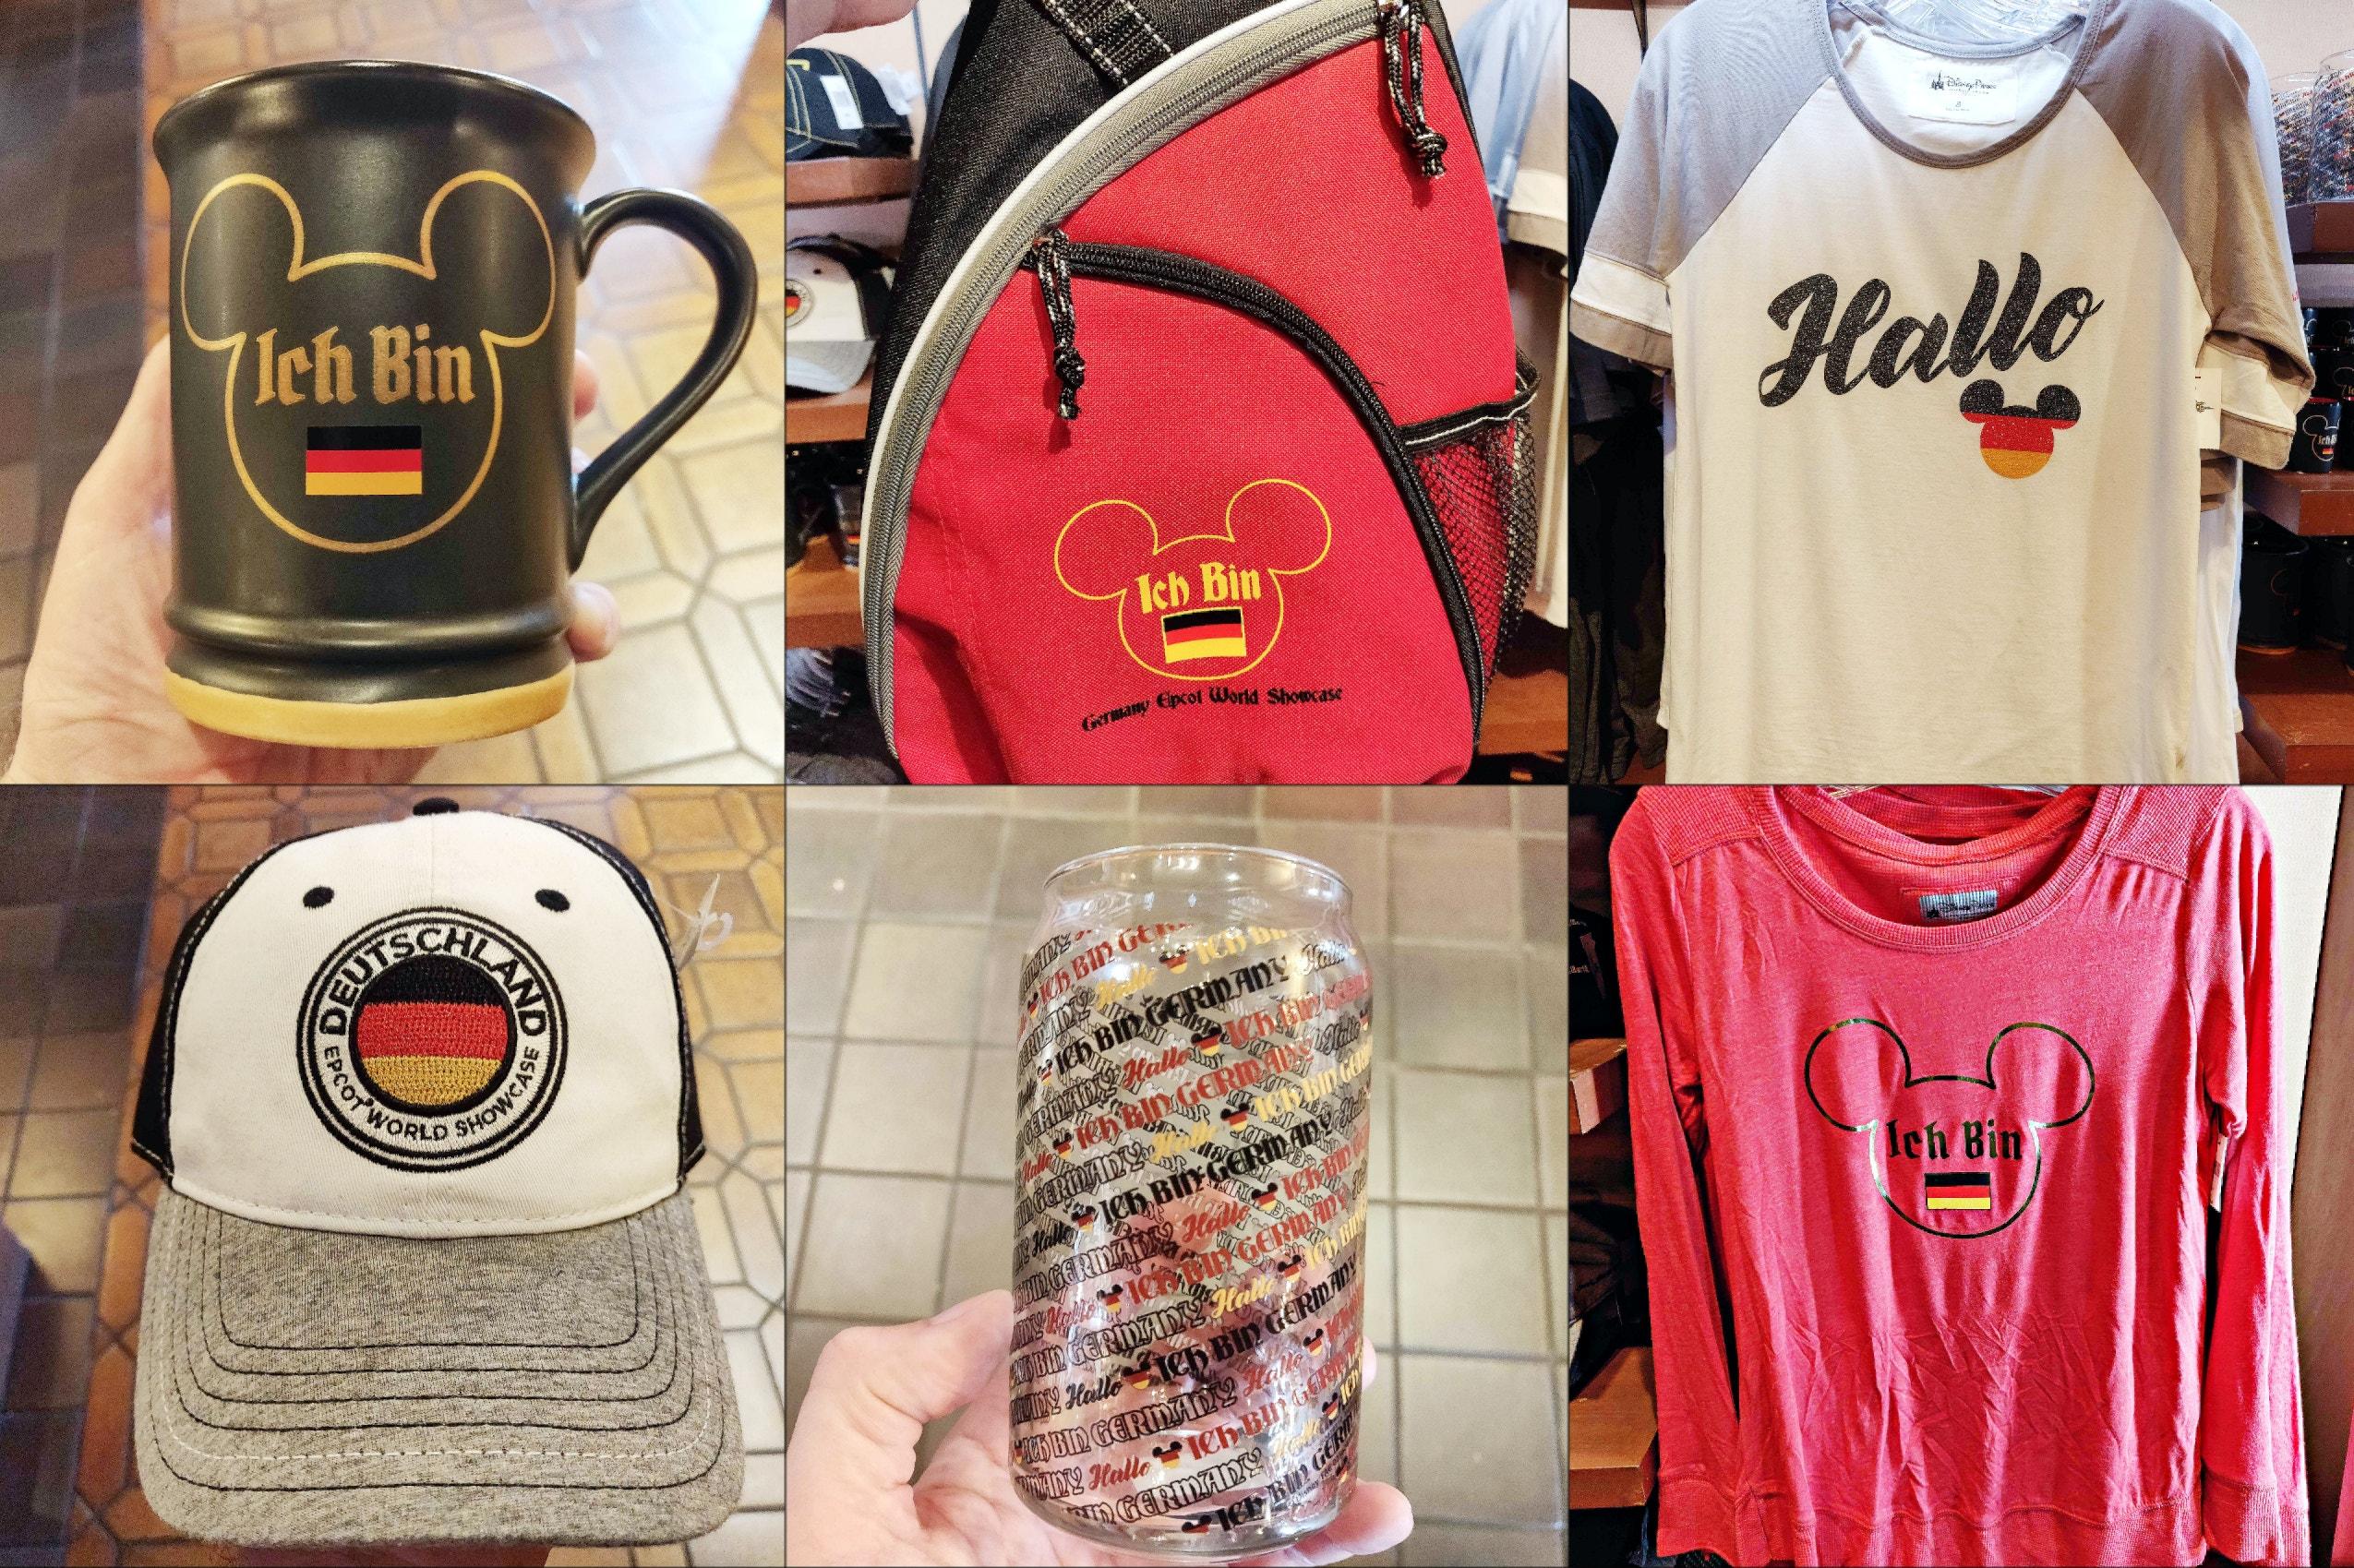 germany-epcot-merchandise-02-15-2020-collage.jpg